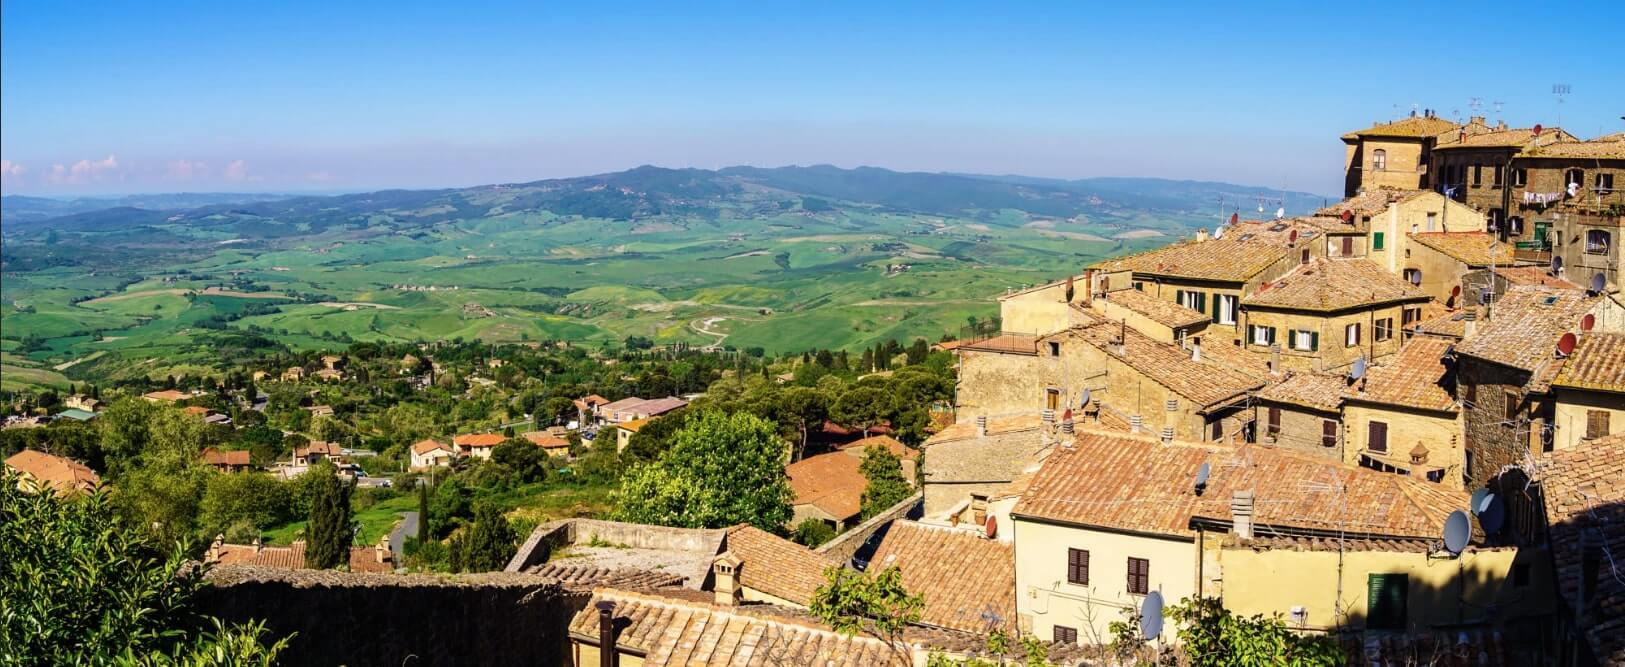 Volterra city view